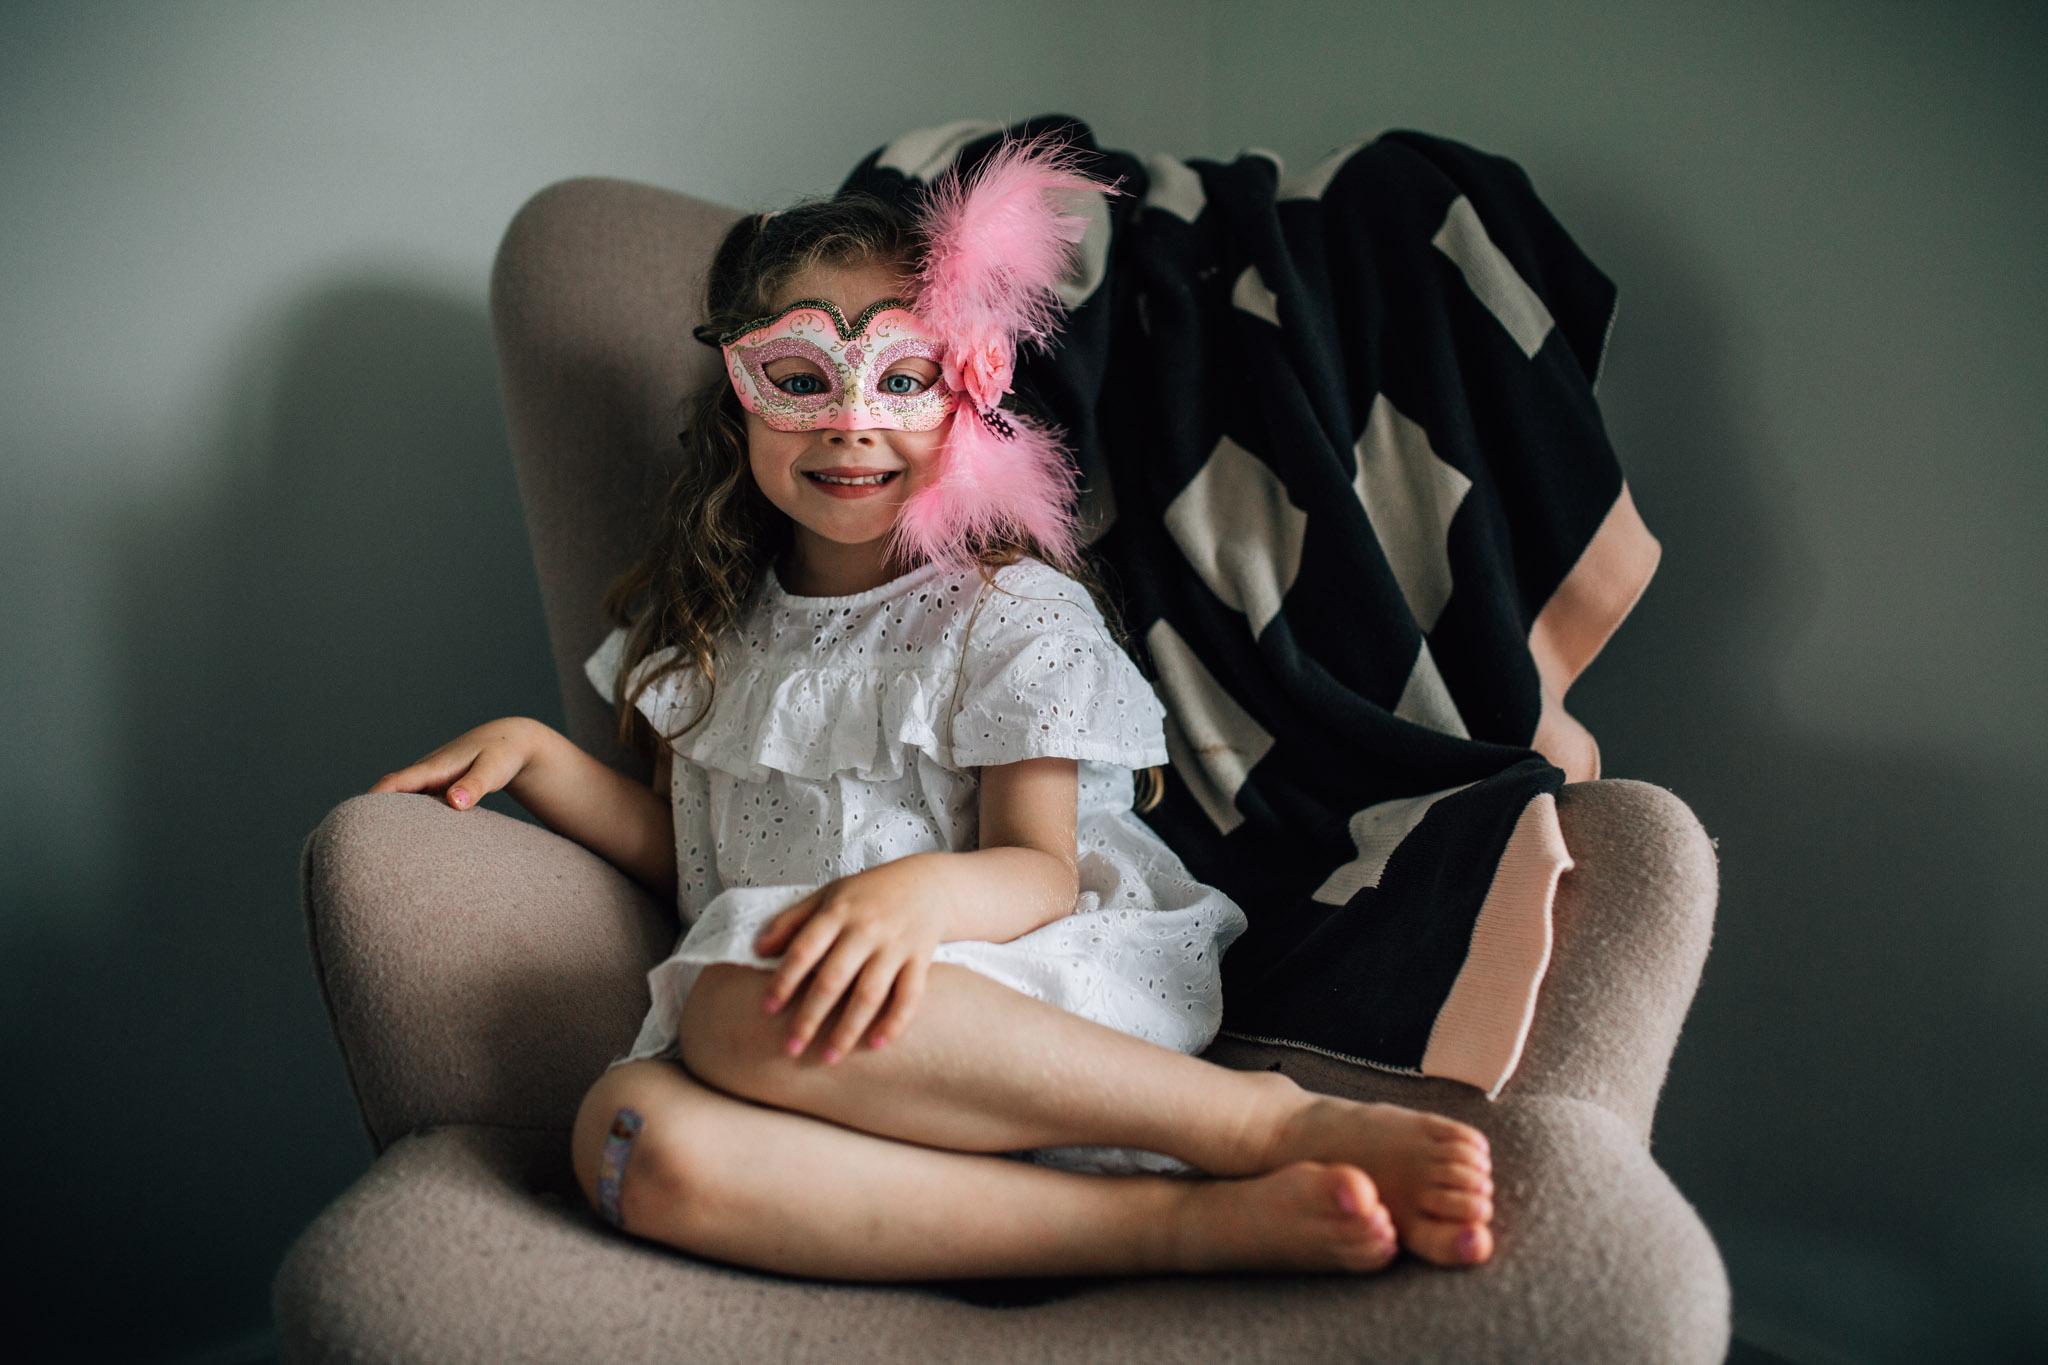 little-girl-wearing-costume-masquerade-mask (1 of 1).jpg